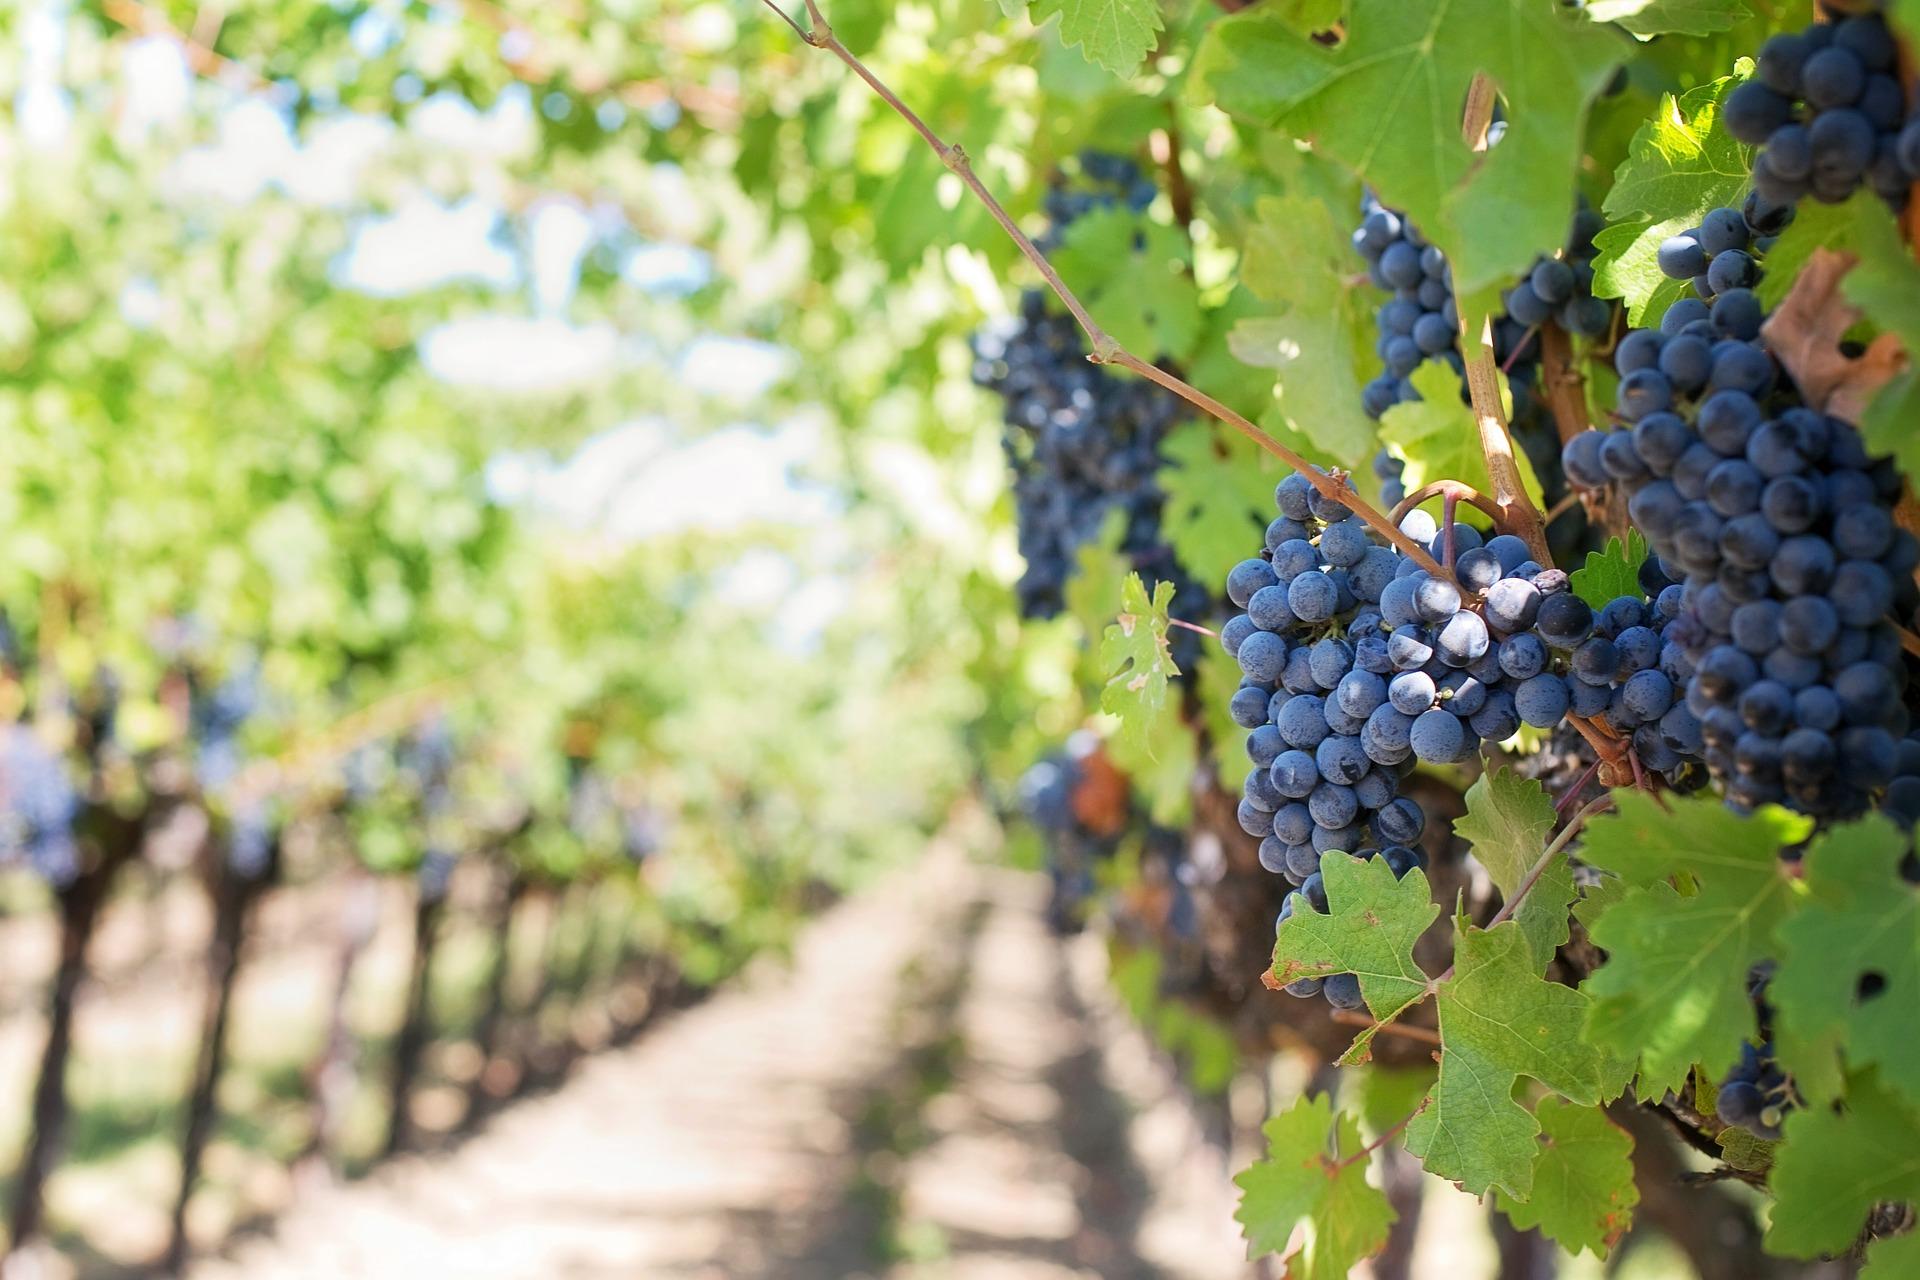 purple-grapes-553462_1920.jpg